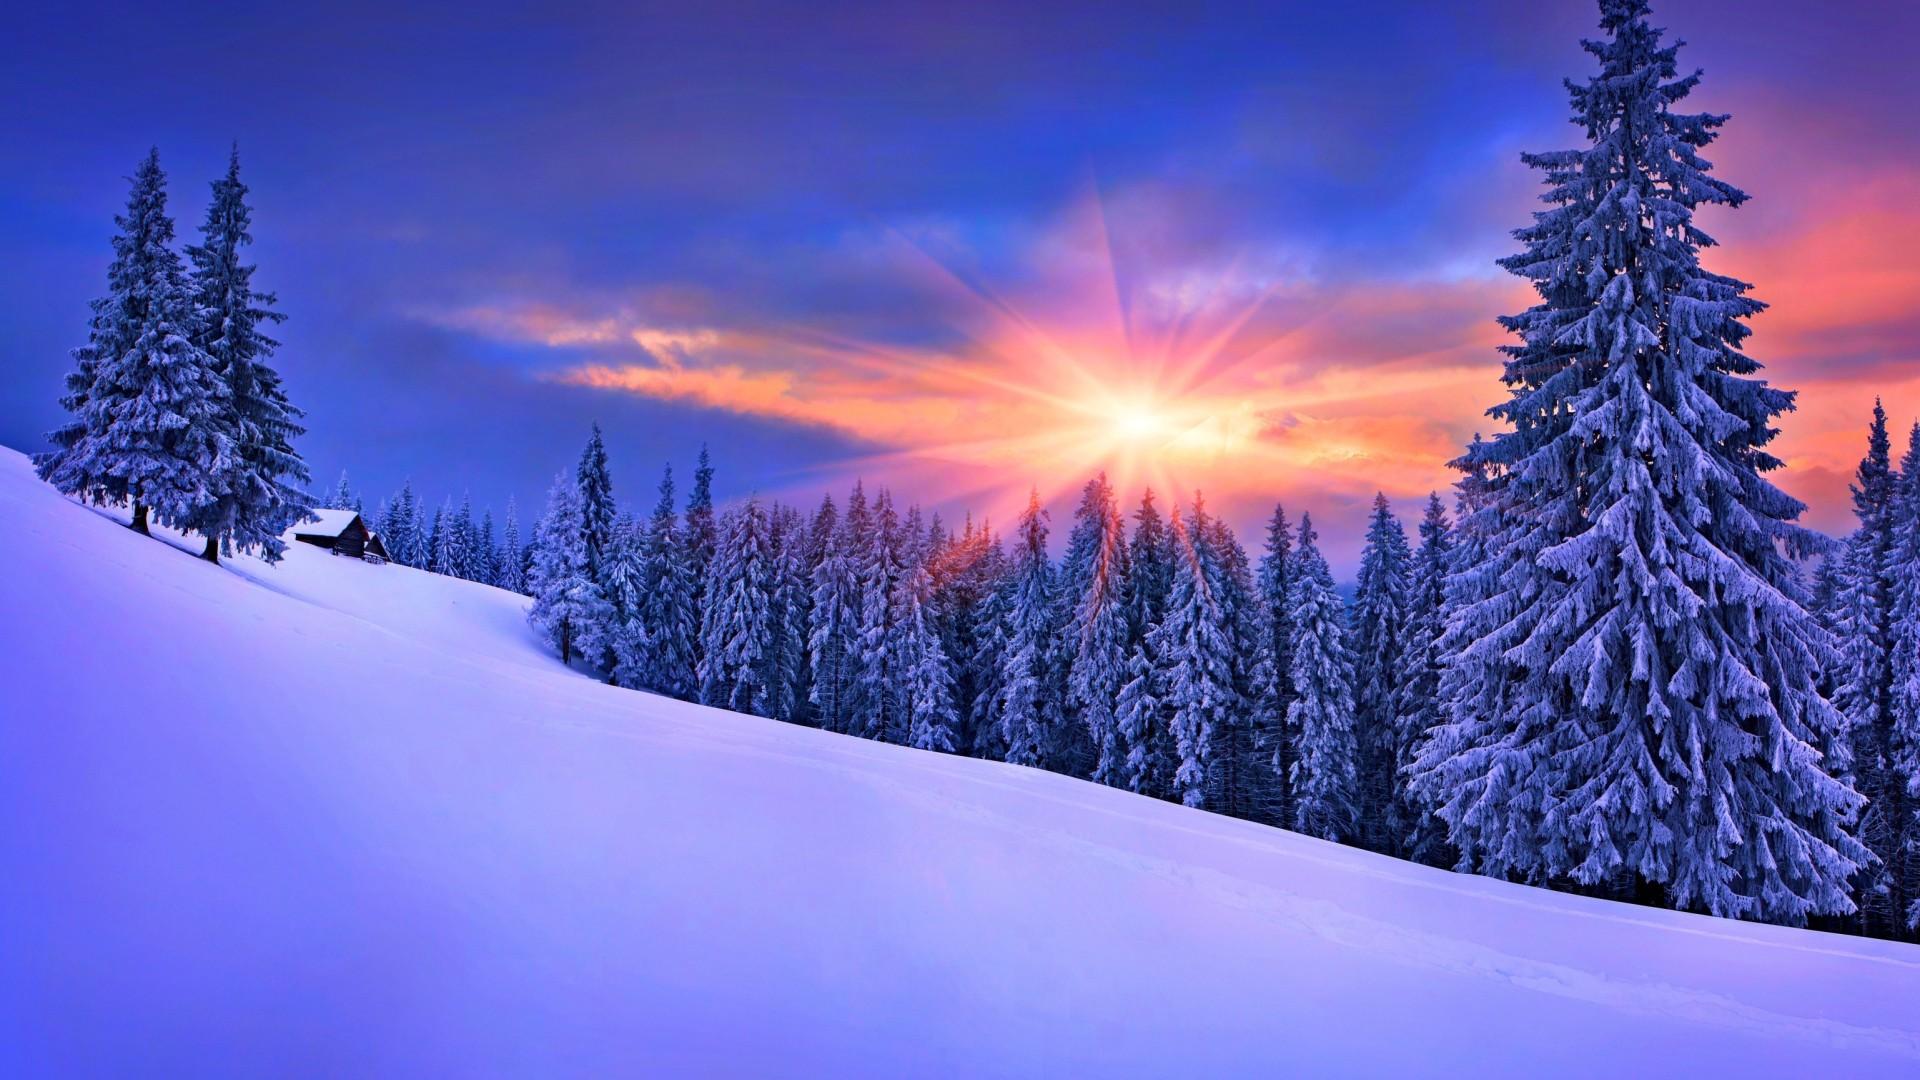 Winter Train Background Wallpaper Hd Winter Sunshine 1920x1080 Download Hd Wallpaper Wallpapertip